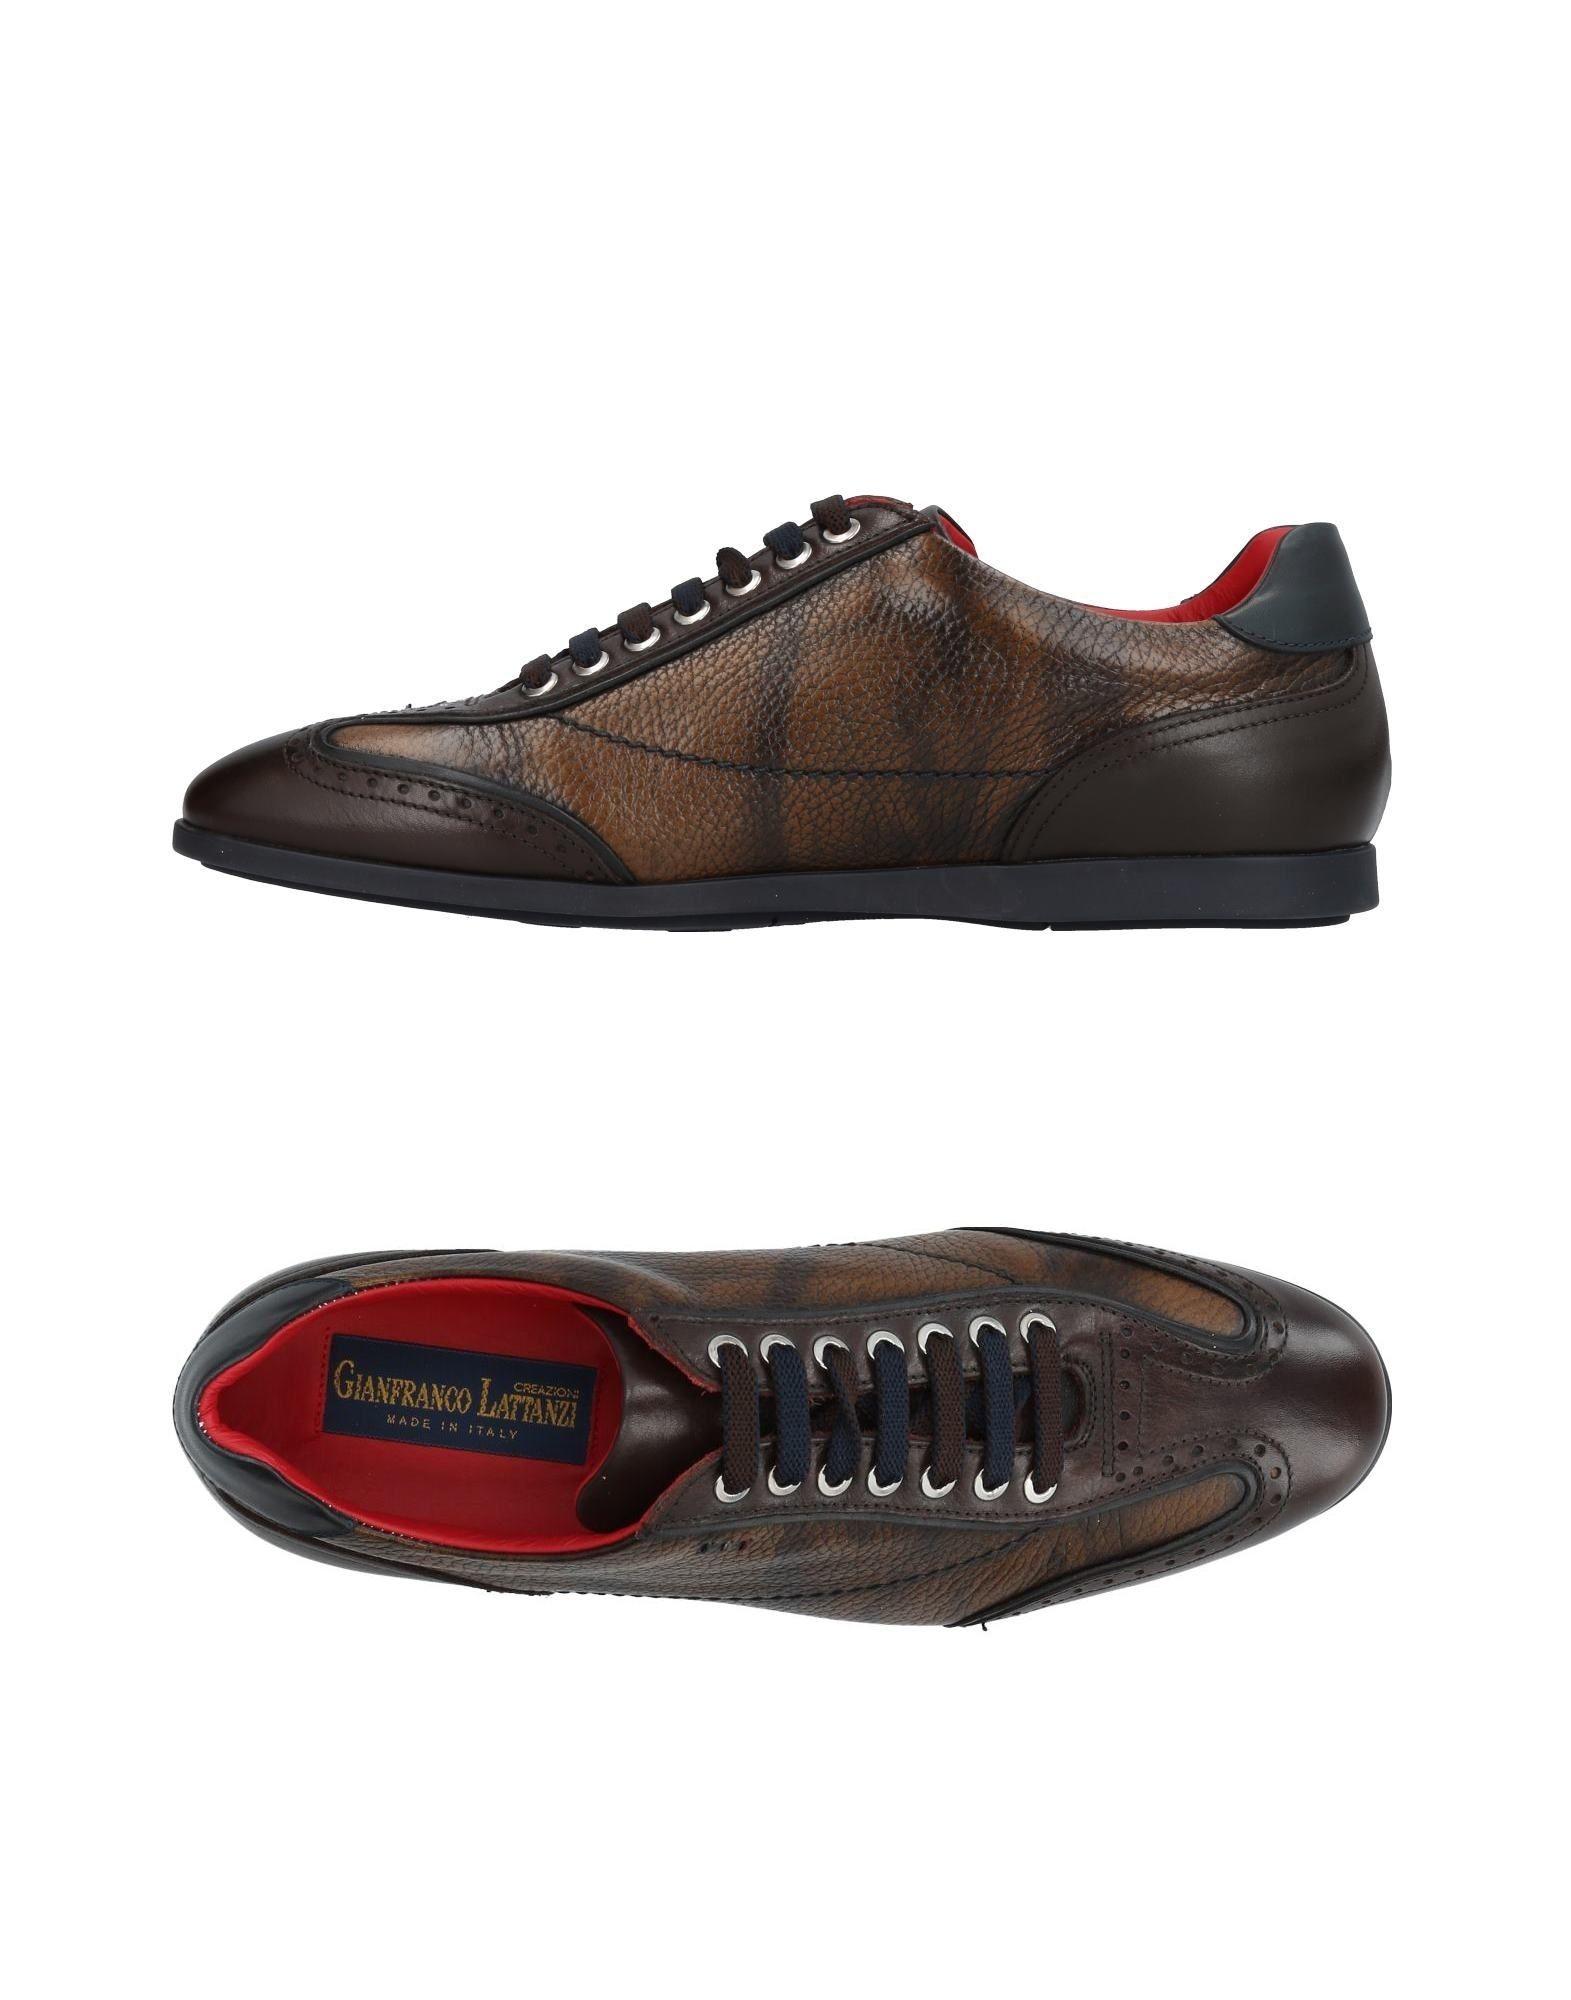 Sneakers Gianfranco Lattanzi Homme - Sneakers Gianfranco Lattanzi  Moka Mode pas cher et belle